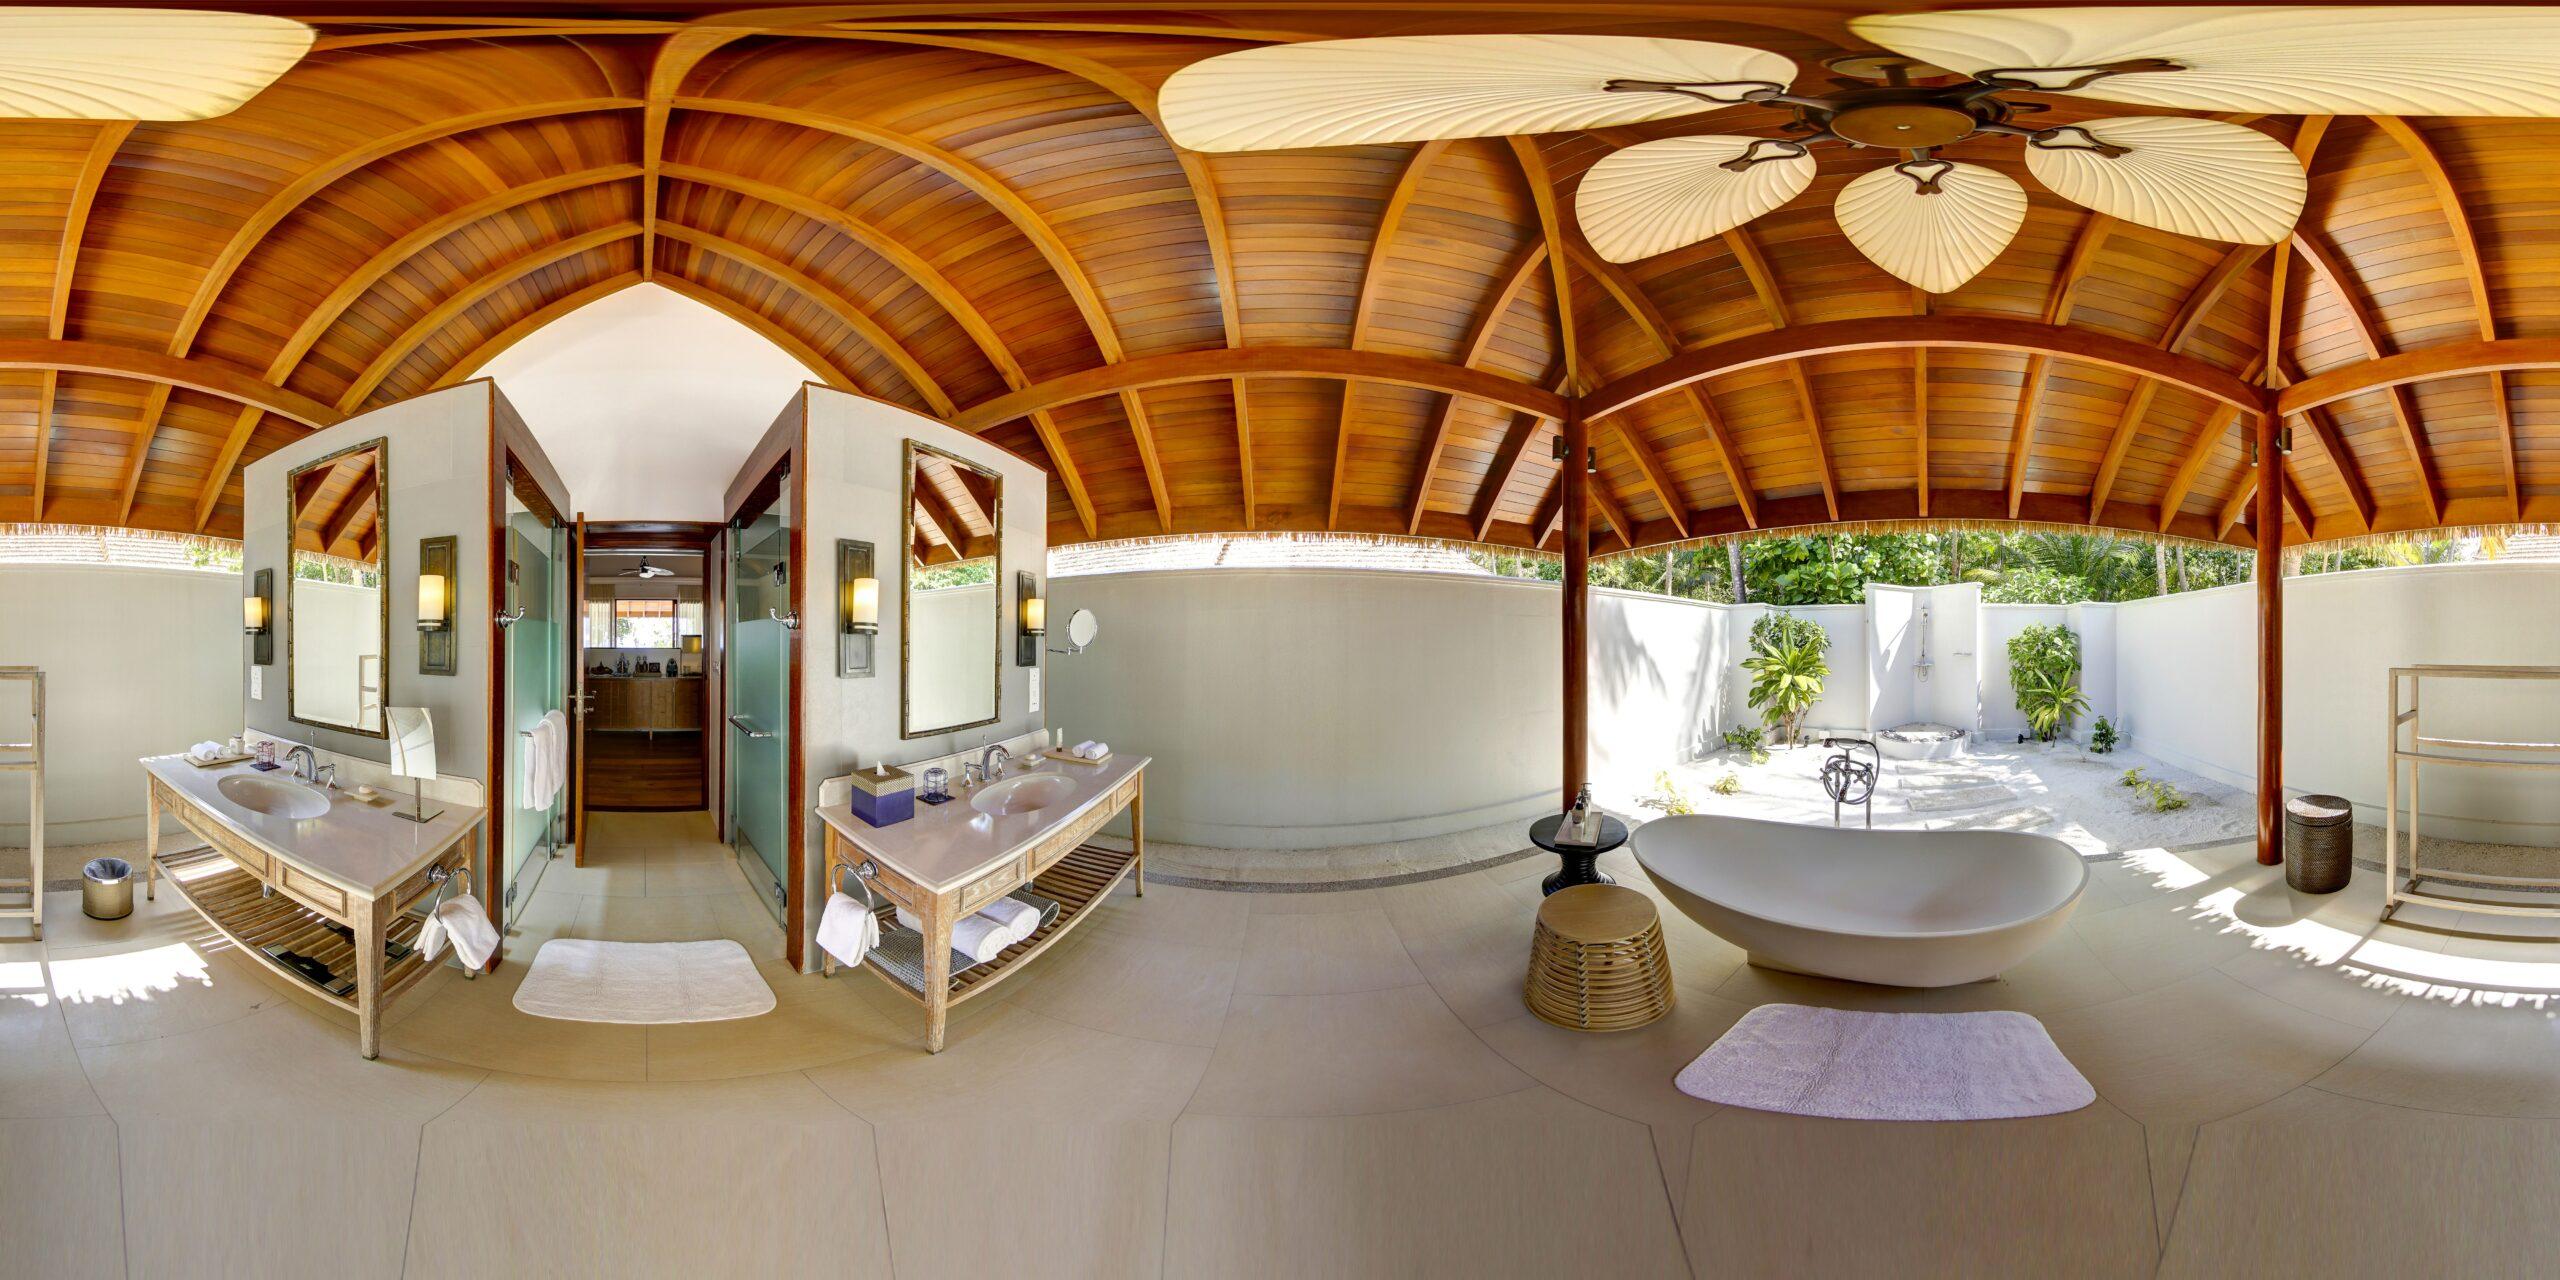 Beach Deluxe Villa With Pool, Bathroom